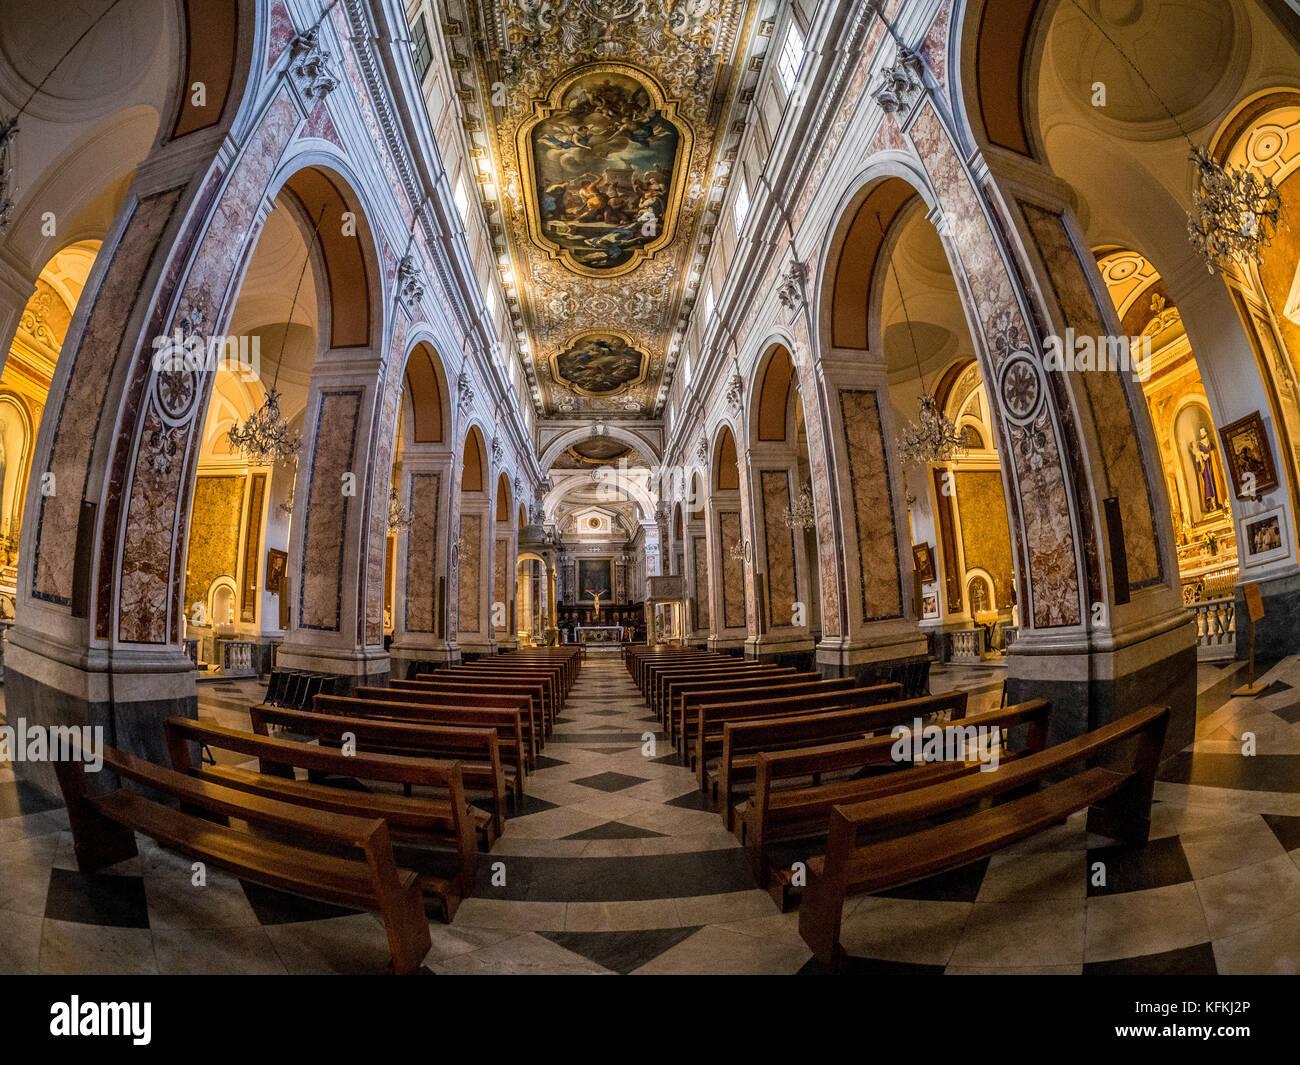 Fisheye shot of the aisle inside Sorrento Cathedral, Italy - Stock Image